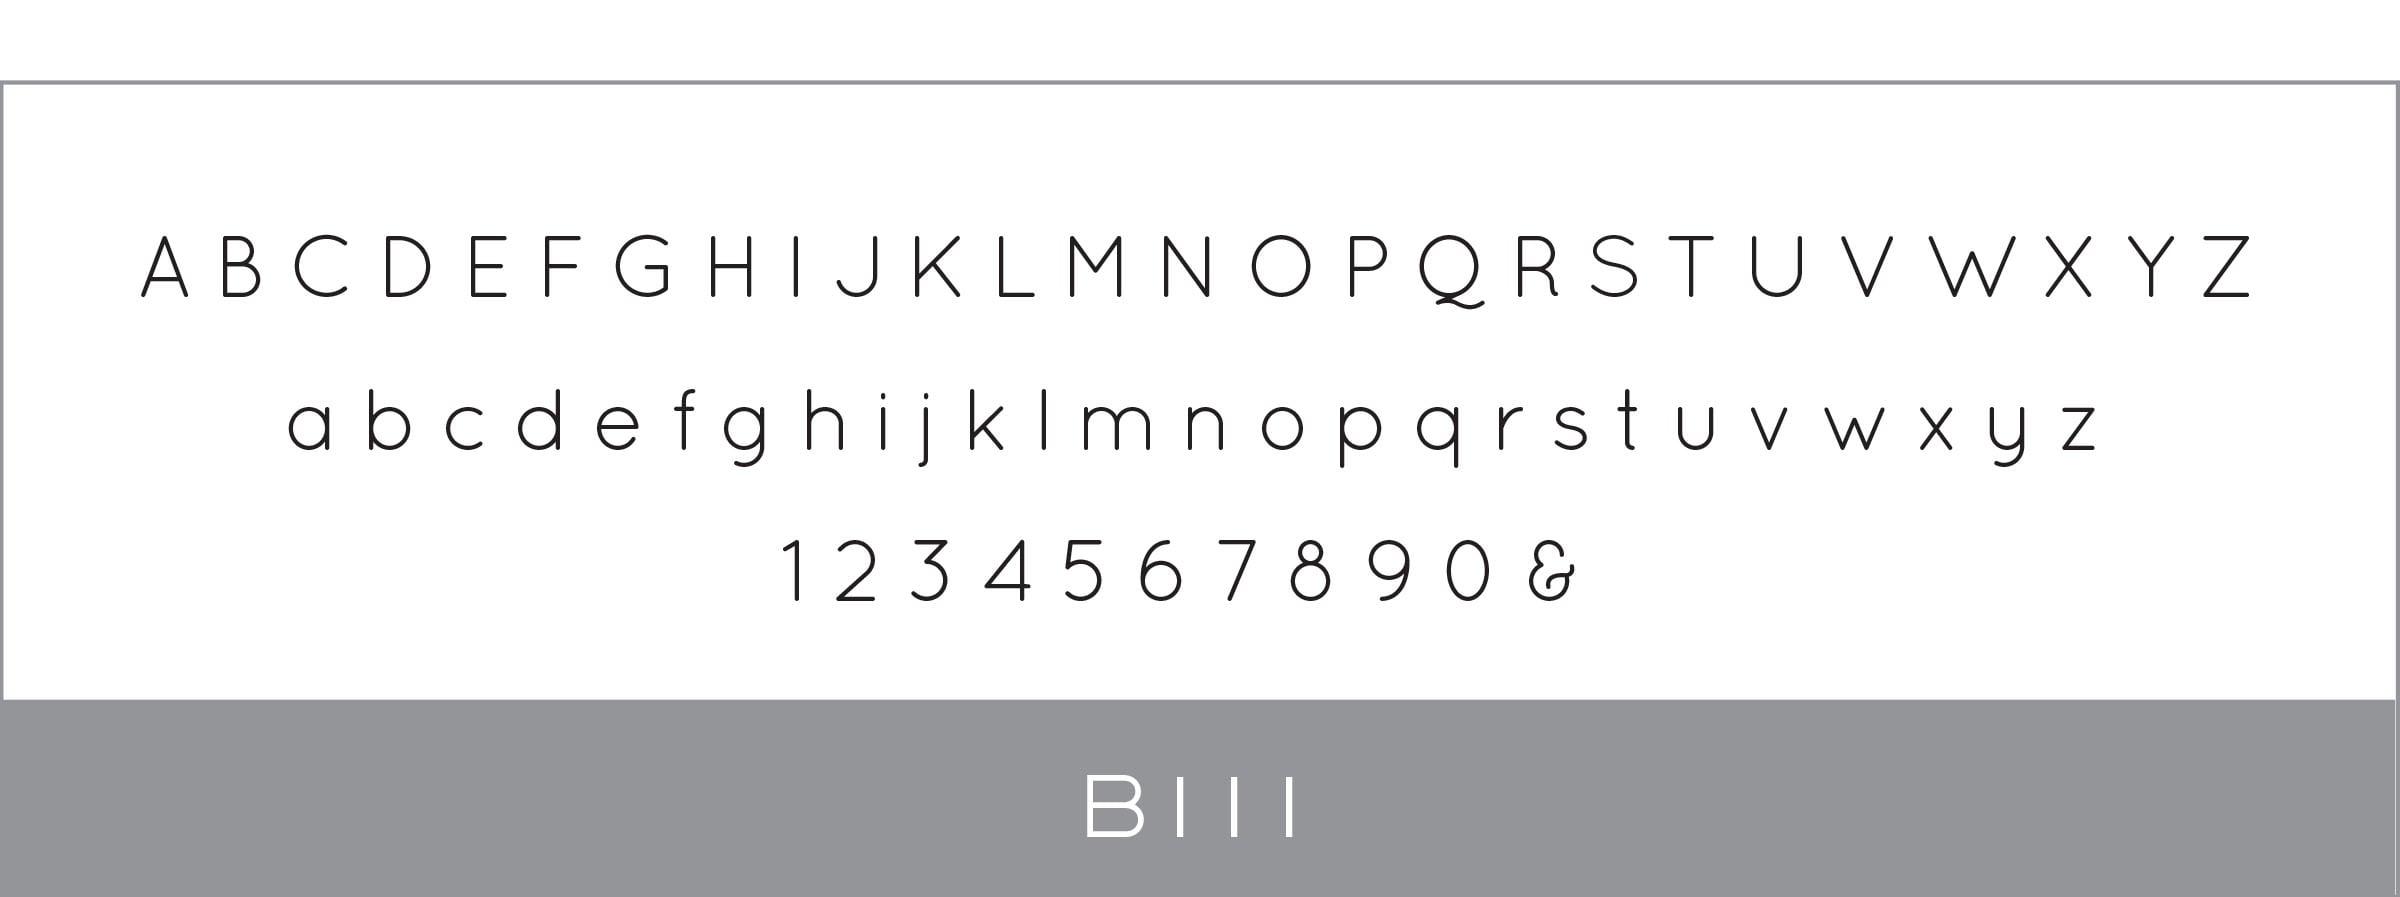 B111_Haute_Papier_Font.jpg